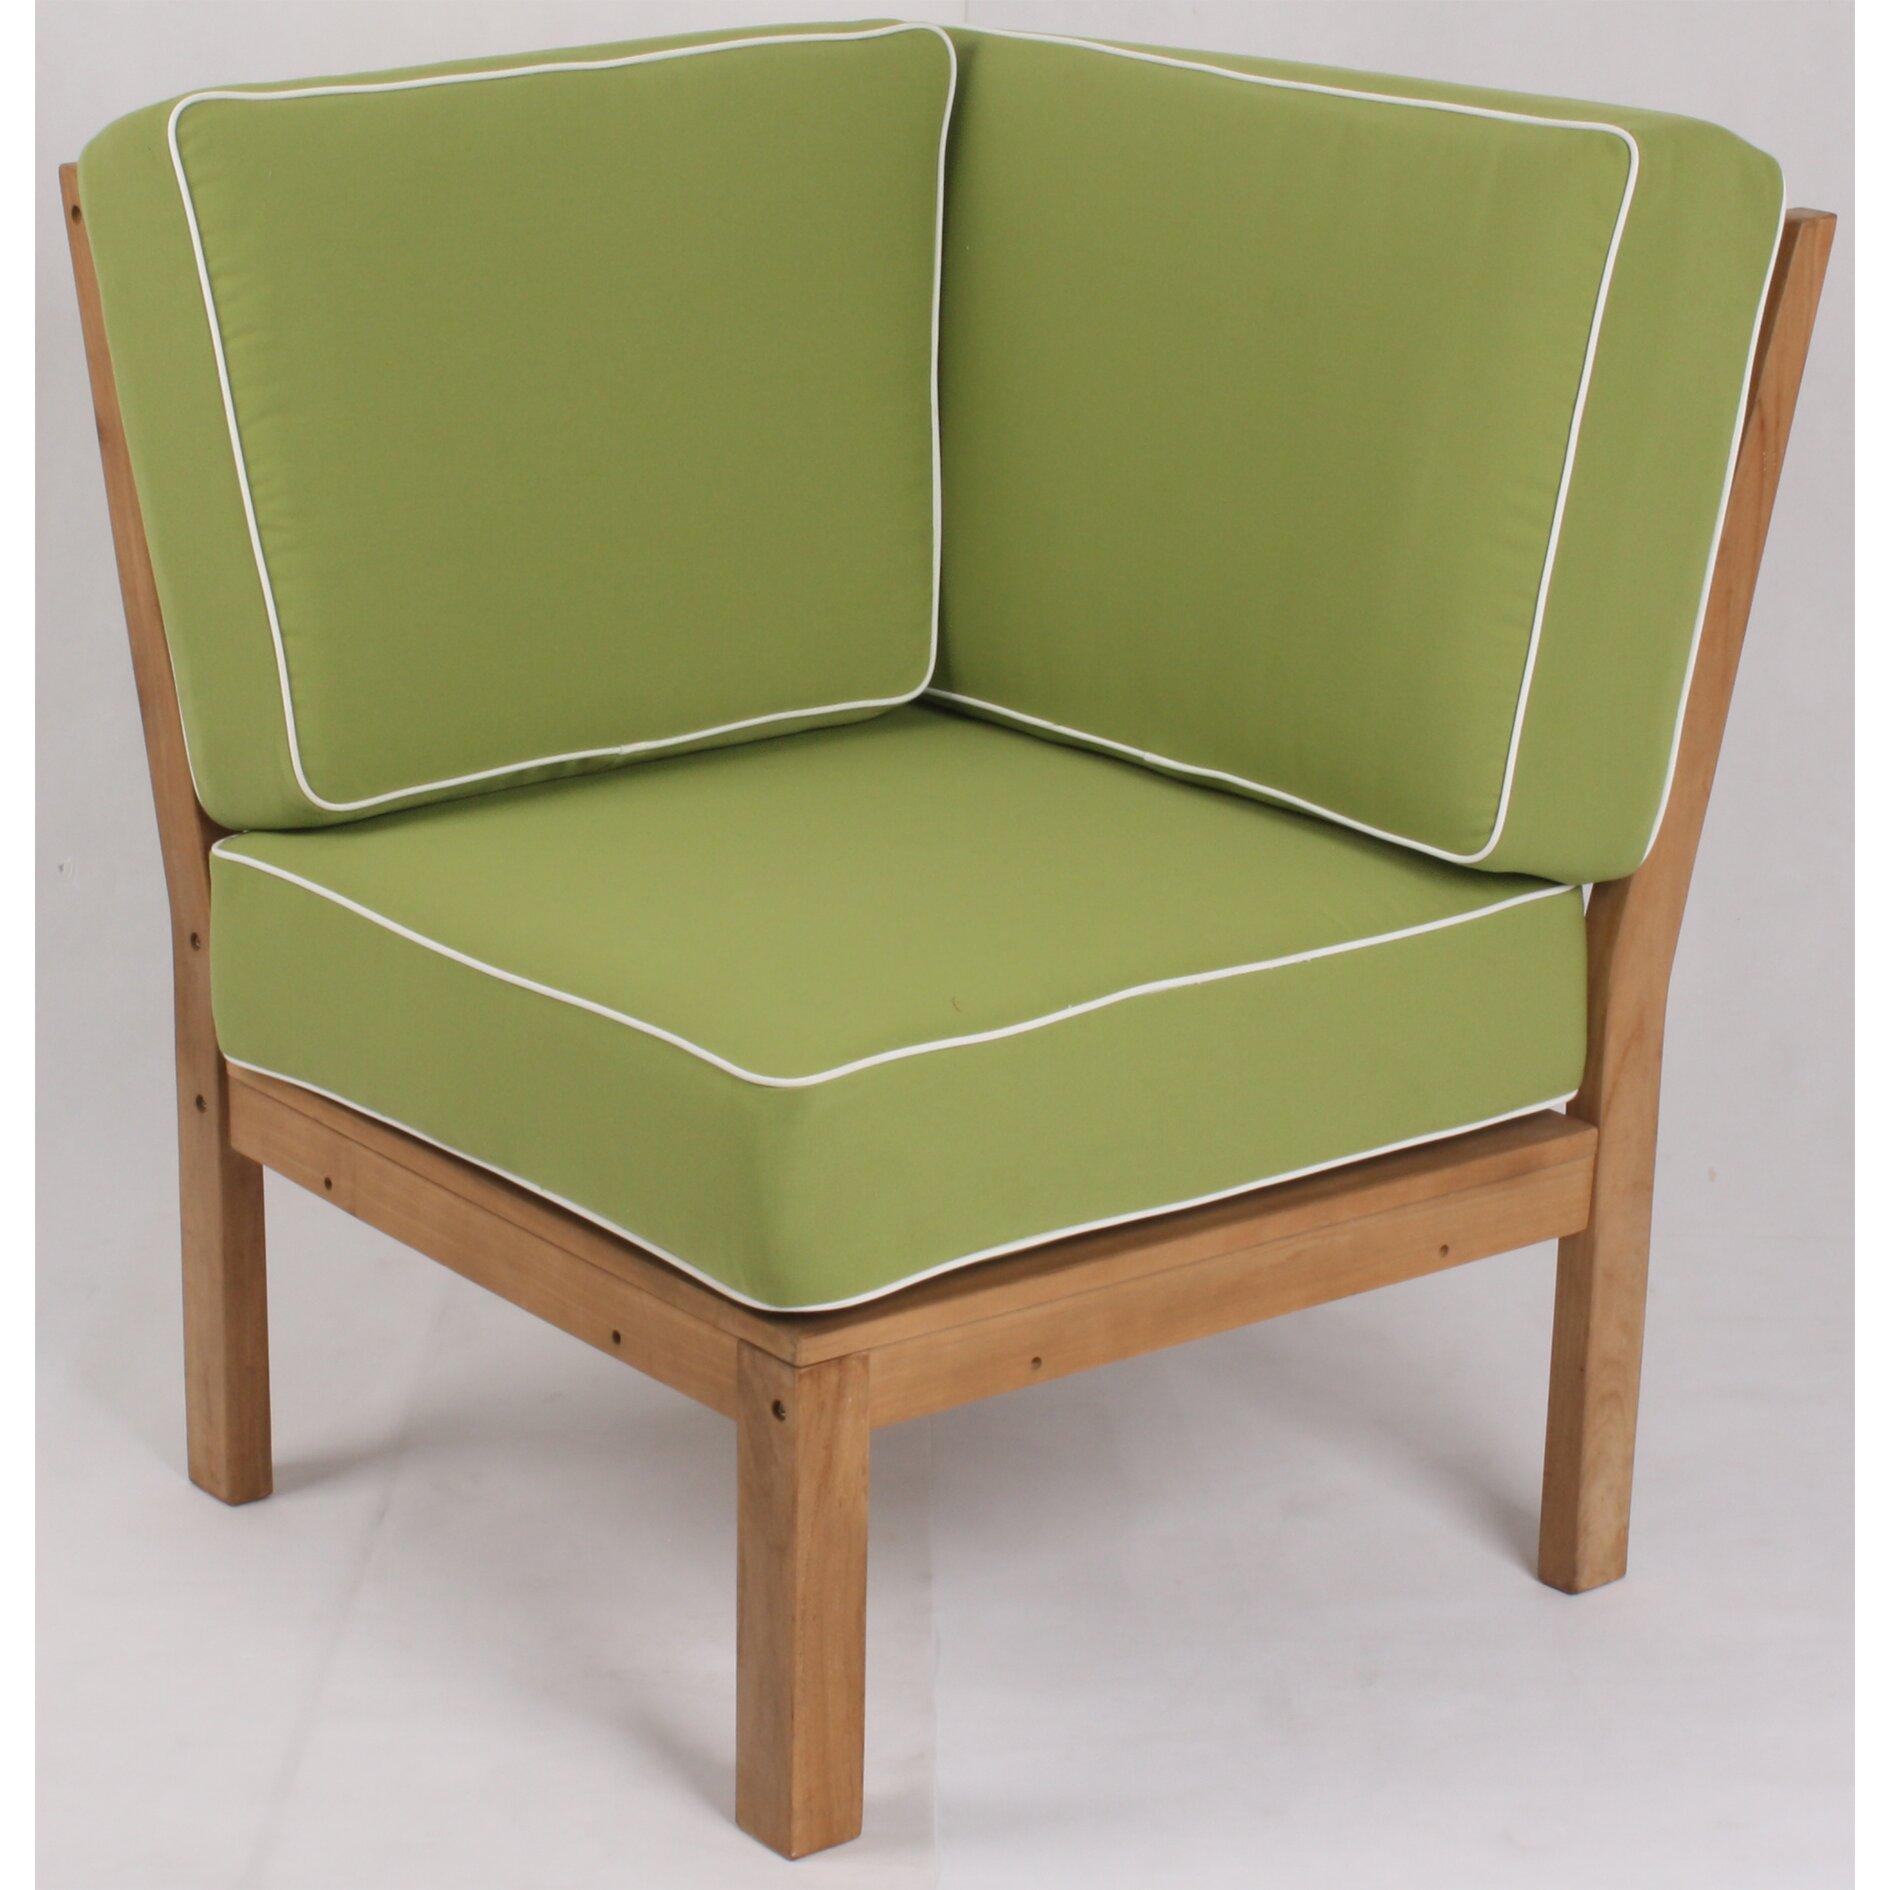 7 Piece Sectional Sofa Co hmmi